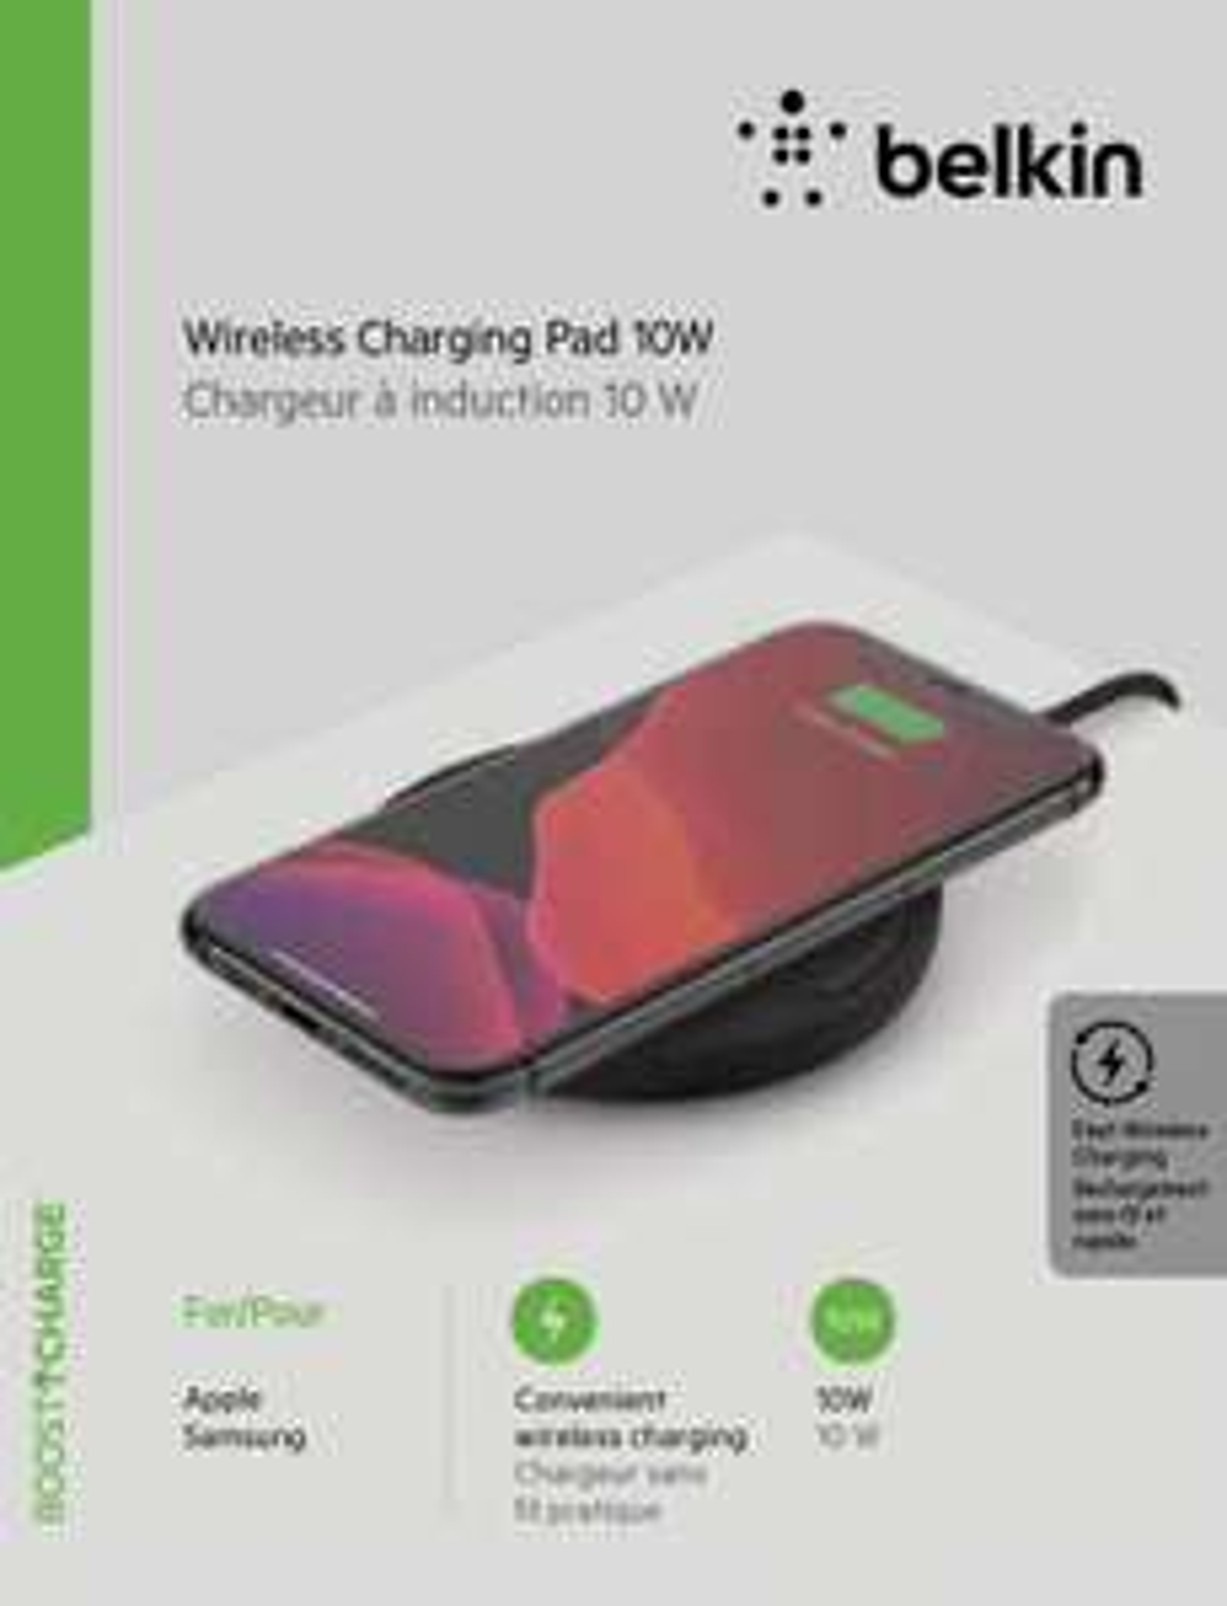 Belkin Wireless Charging Pad (Qi, iPhones bis 7.5W, Samsung bis 10W, sonst 5W, LED-Anzeige, inkl. Quick Charge 3.0-Netzteil & Kabel)